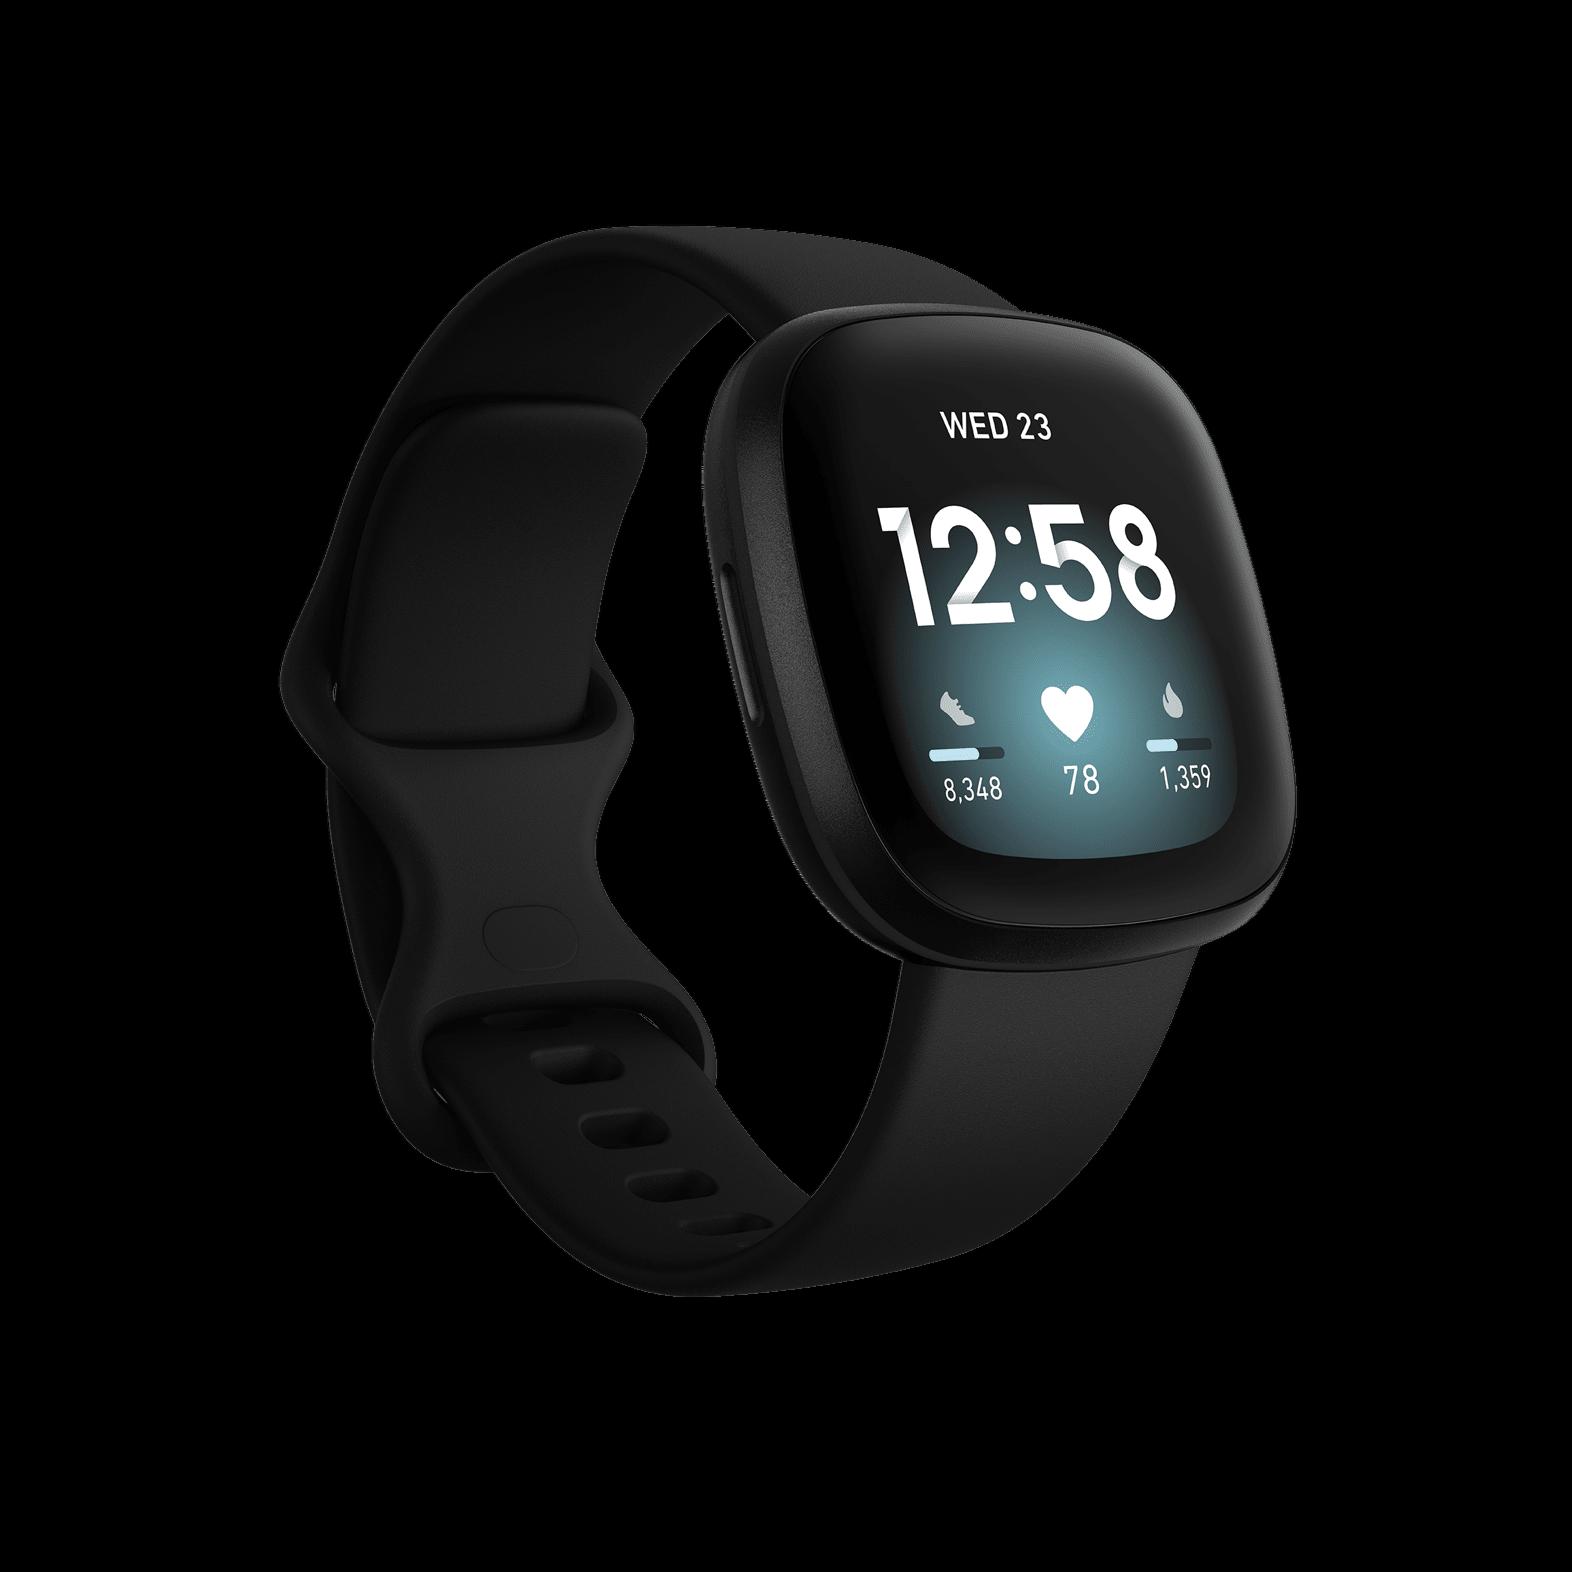 versa 3 health and fitness smartwatch